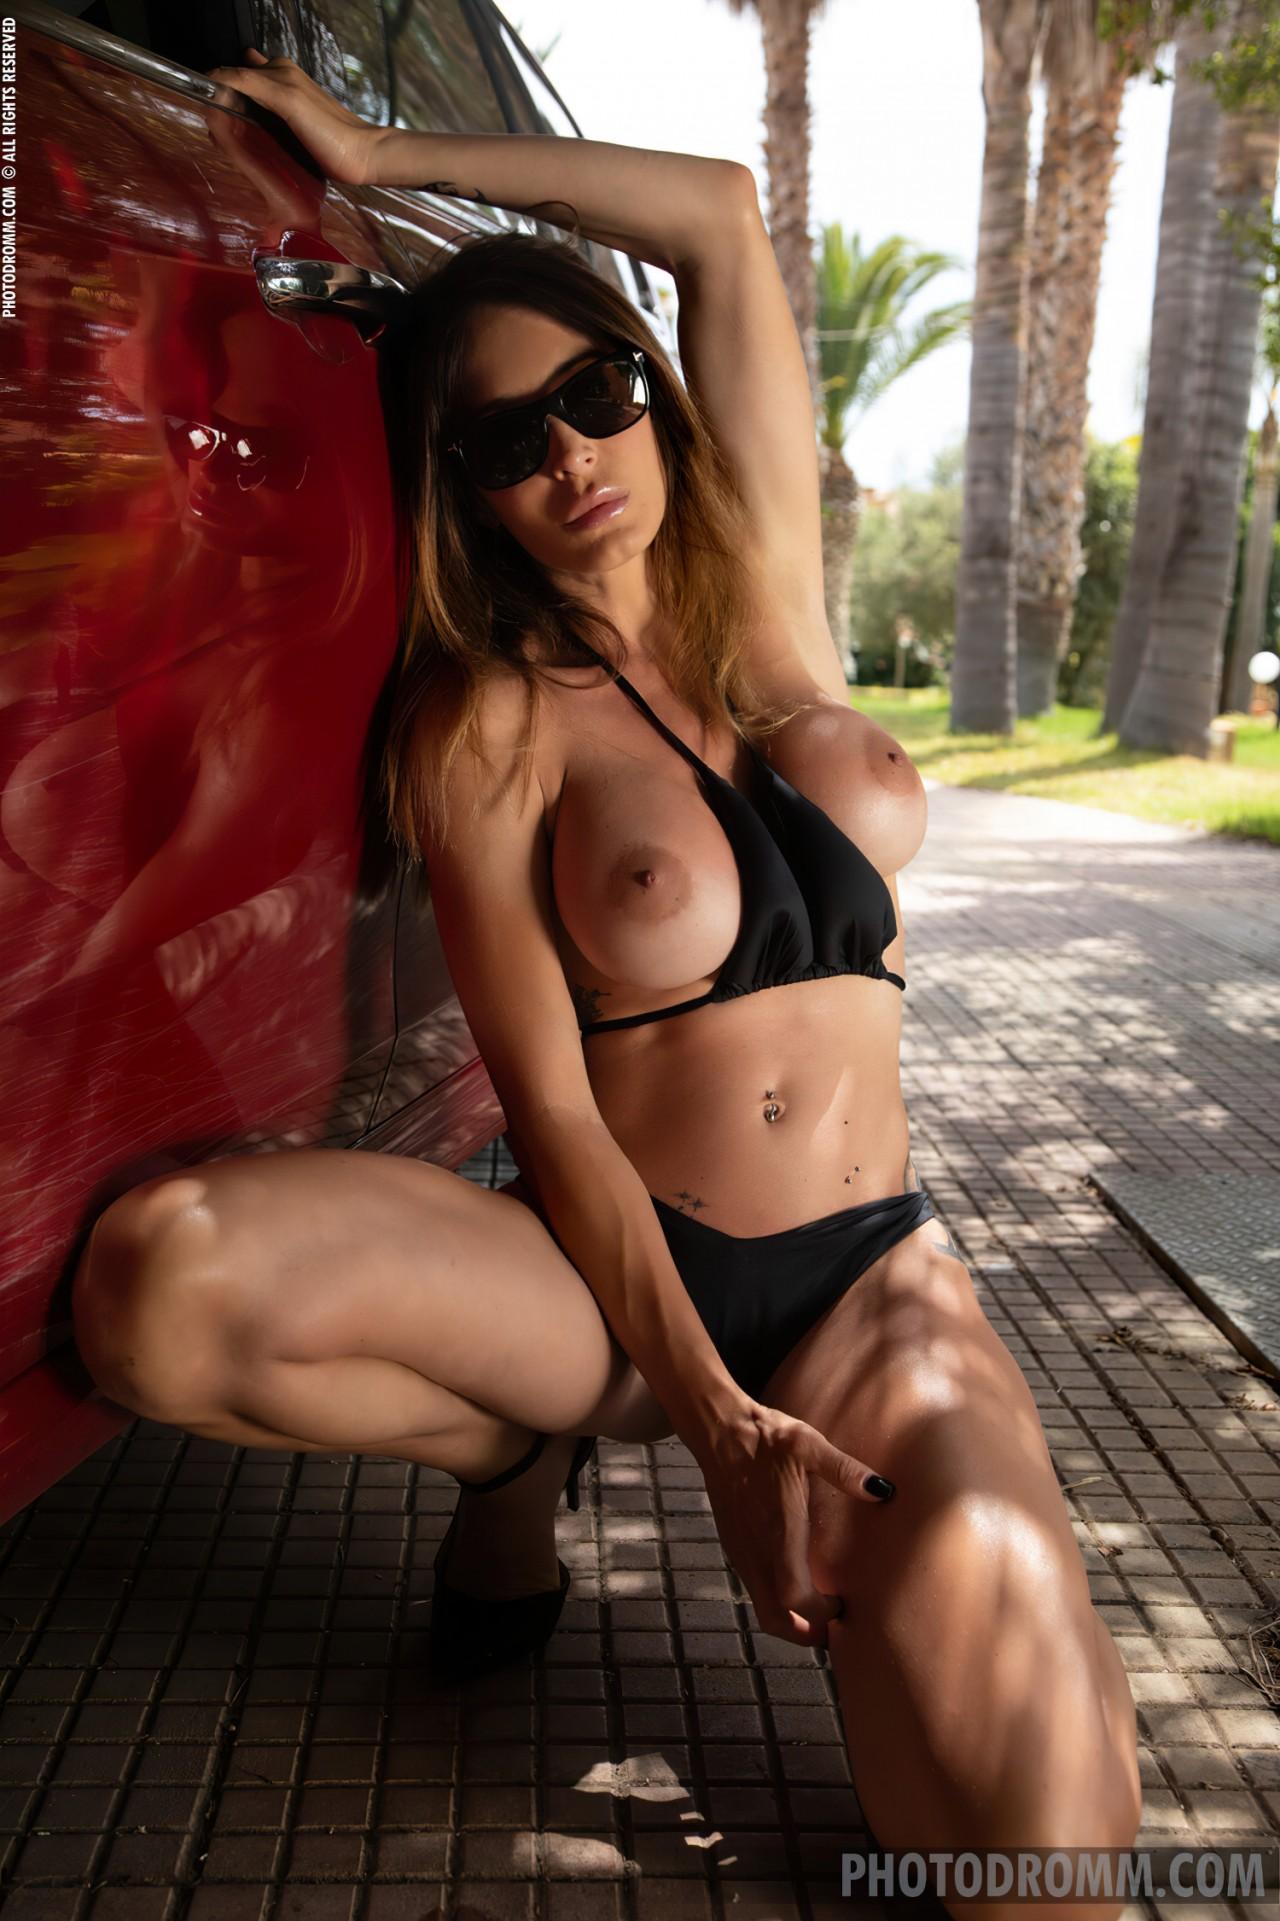 Mulher Lavando Carro Nua (3)